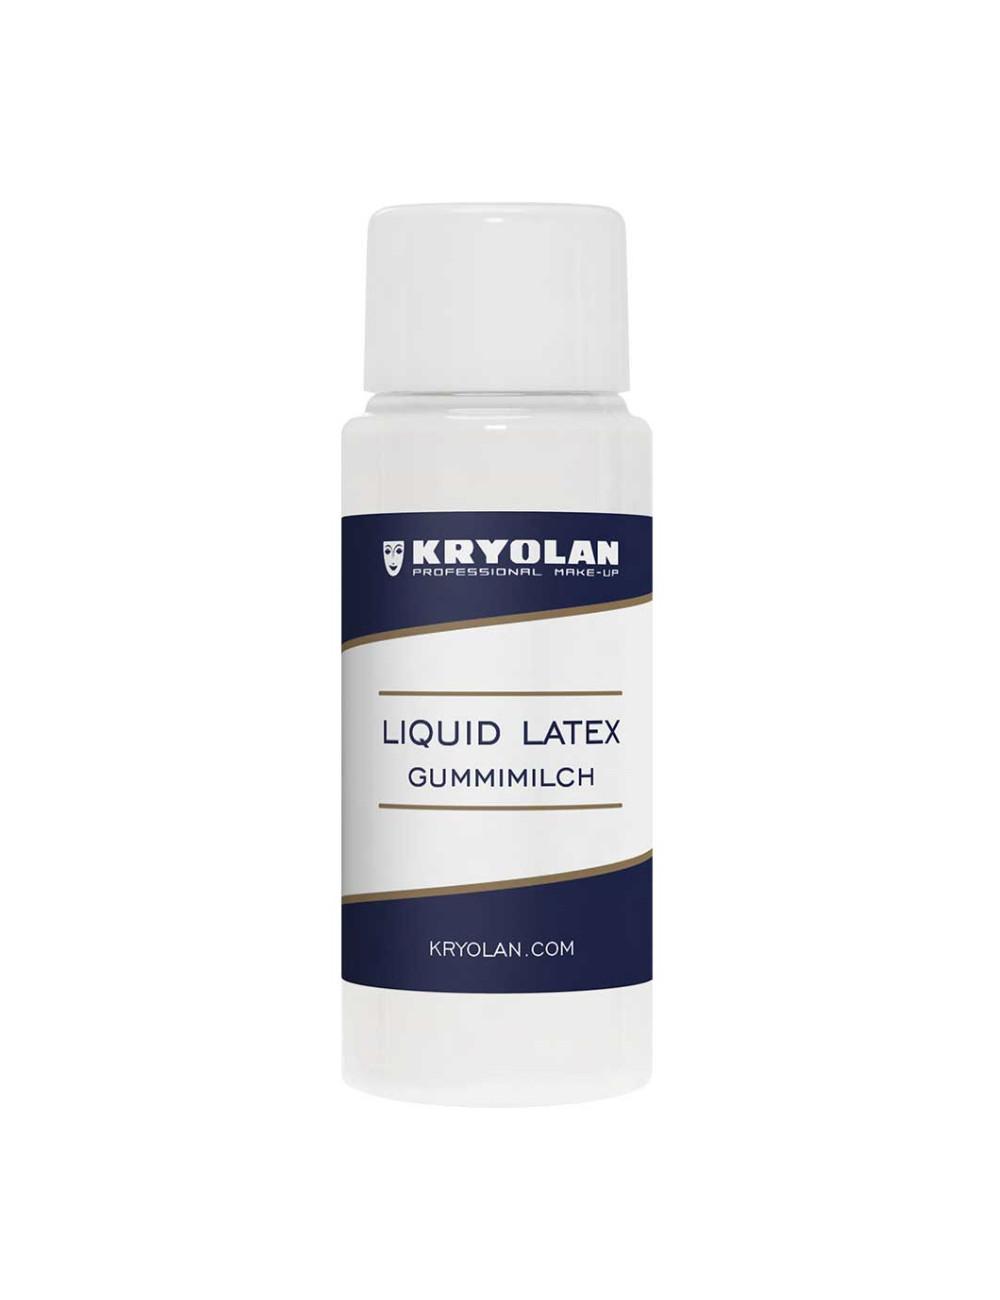 Latex liquide non coloré 30 ml Kryolan